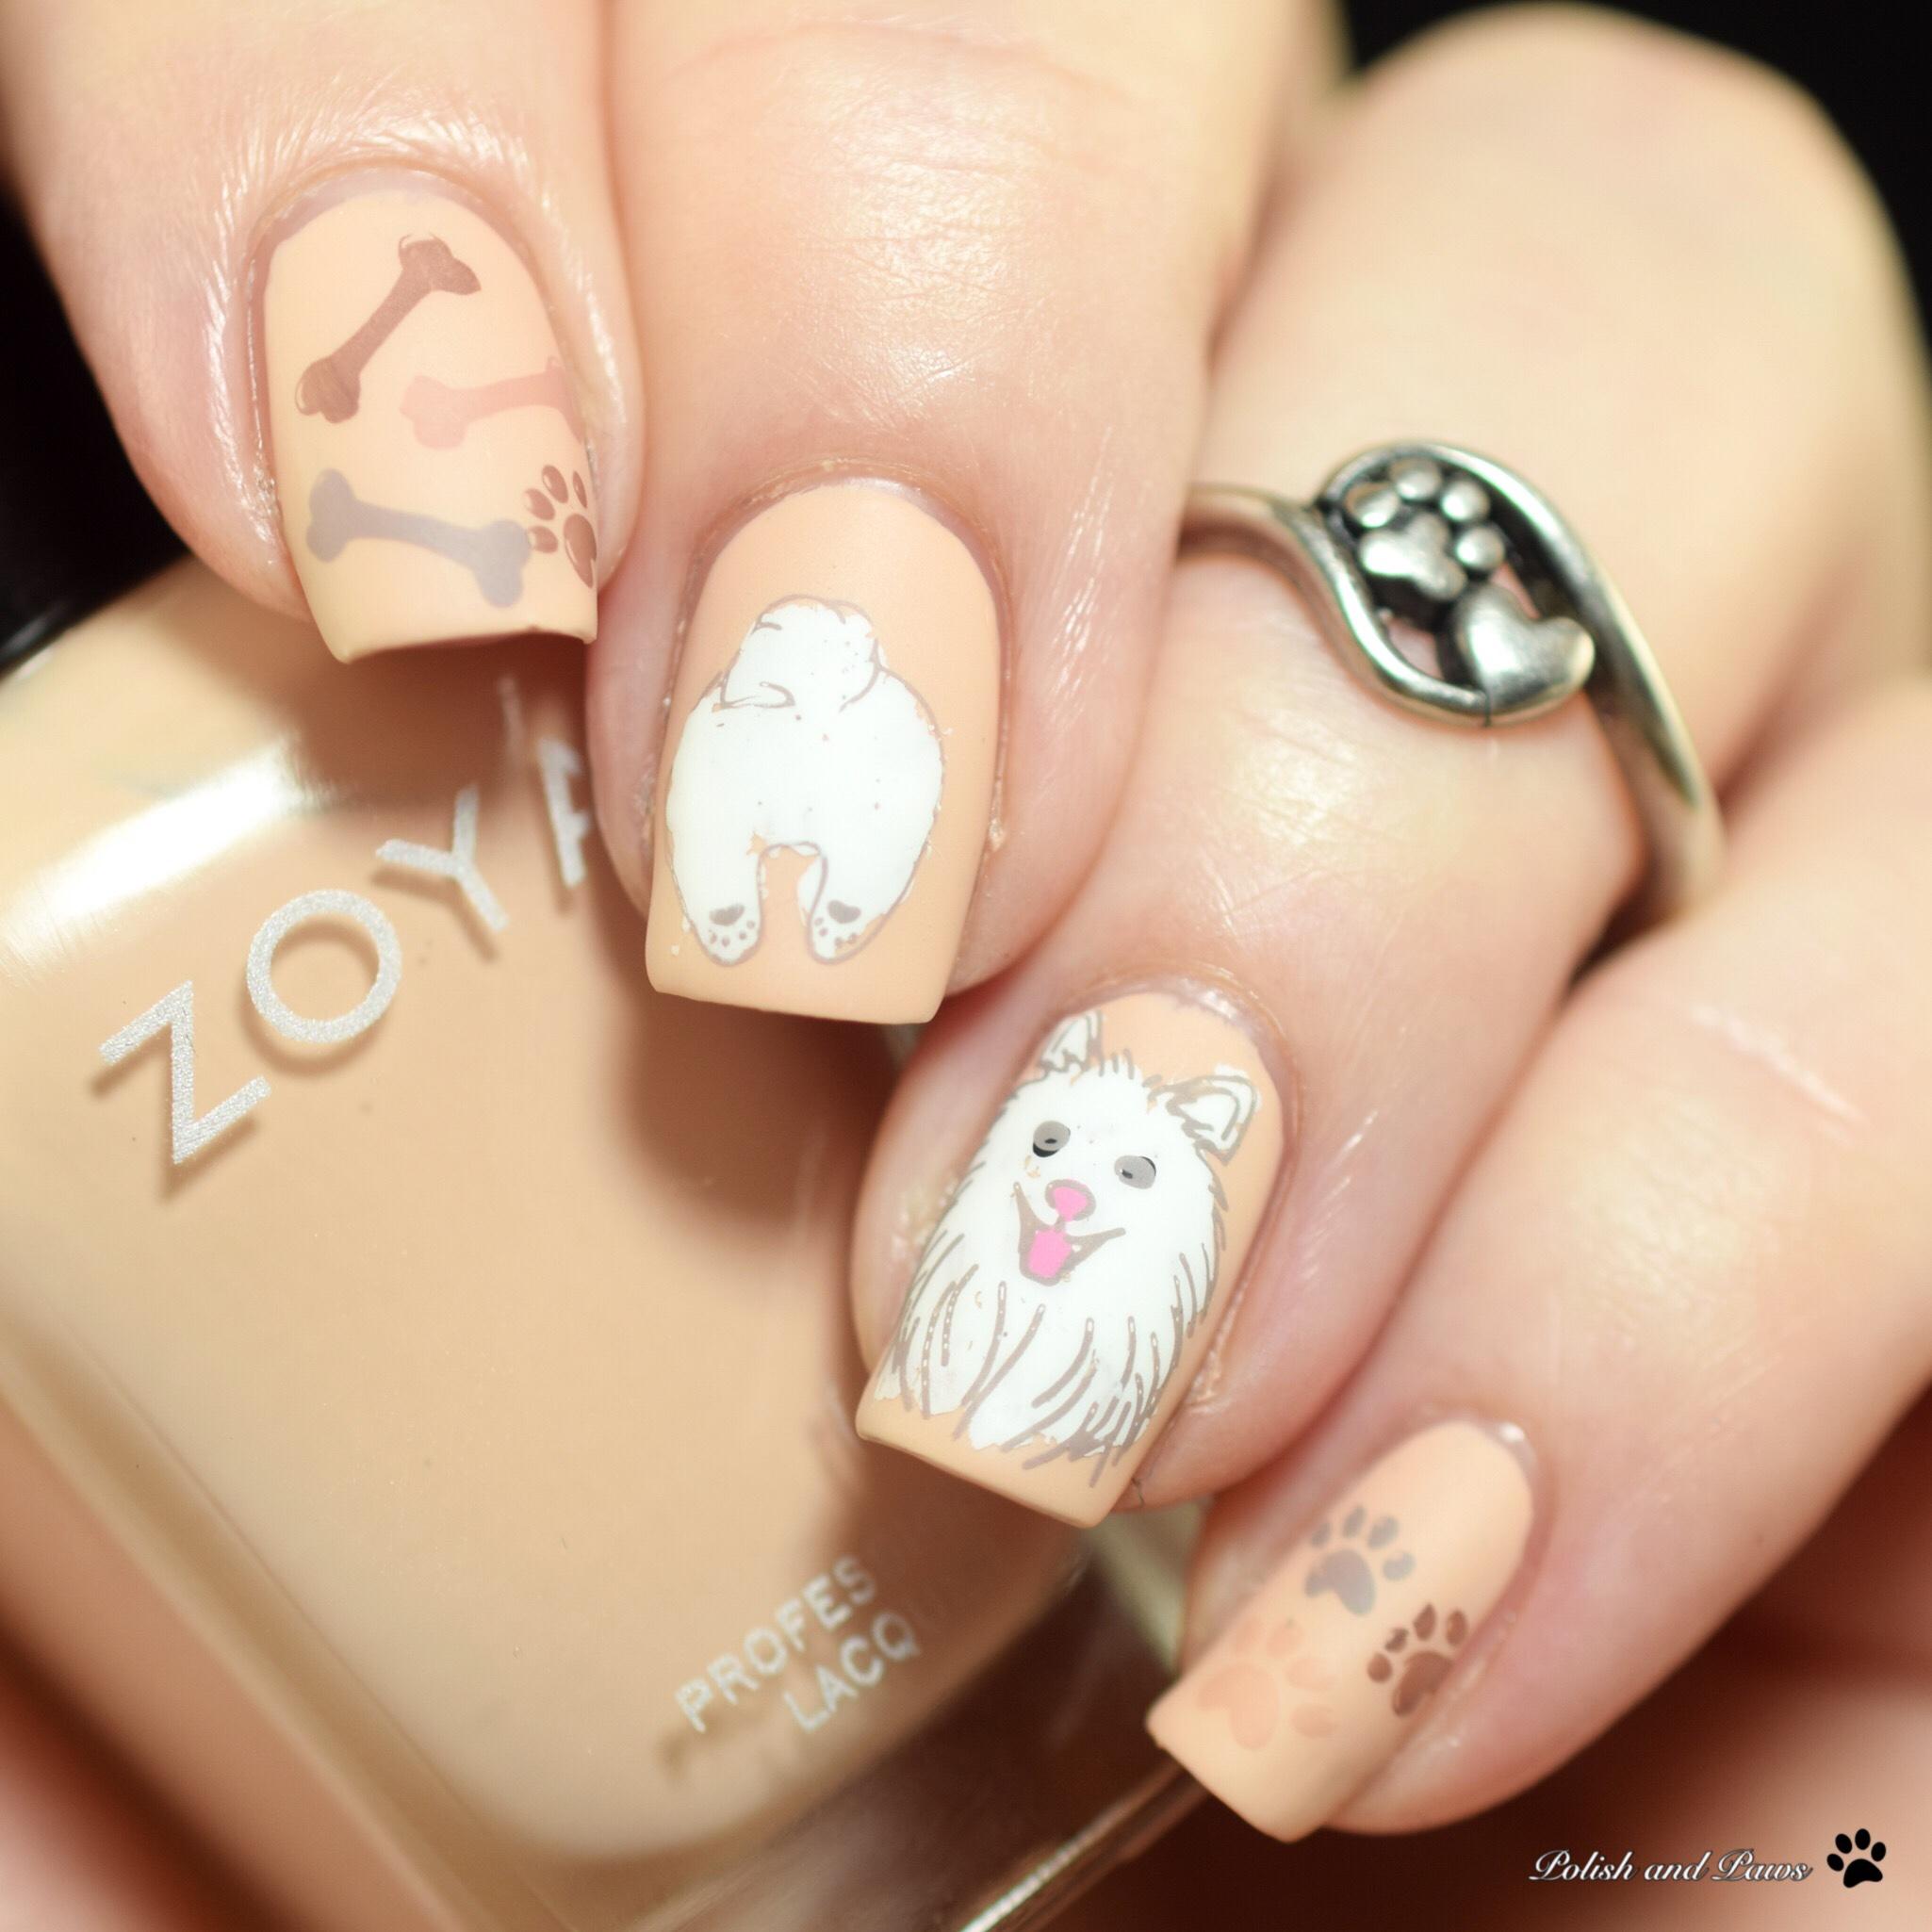 Digital Dozen Polish and Paws Dog Nails